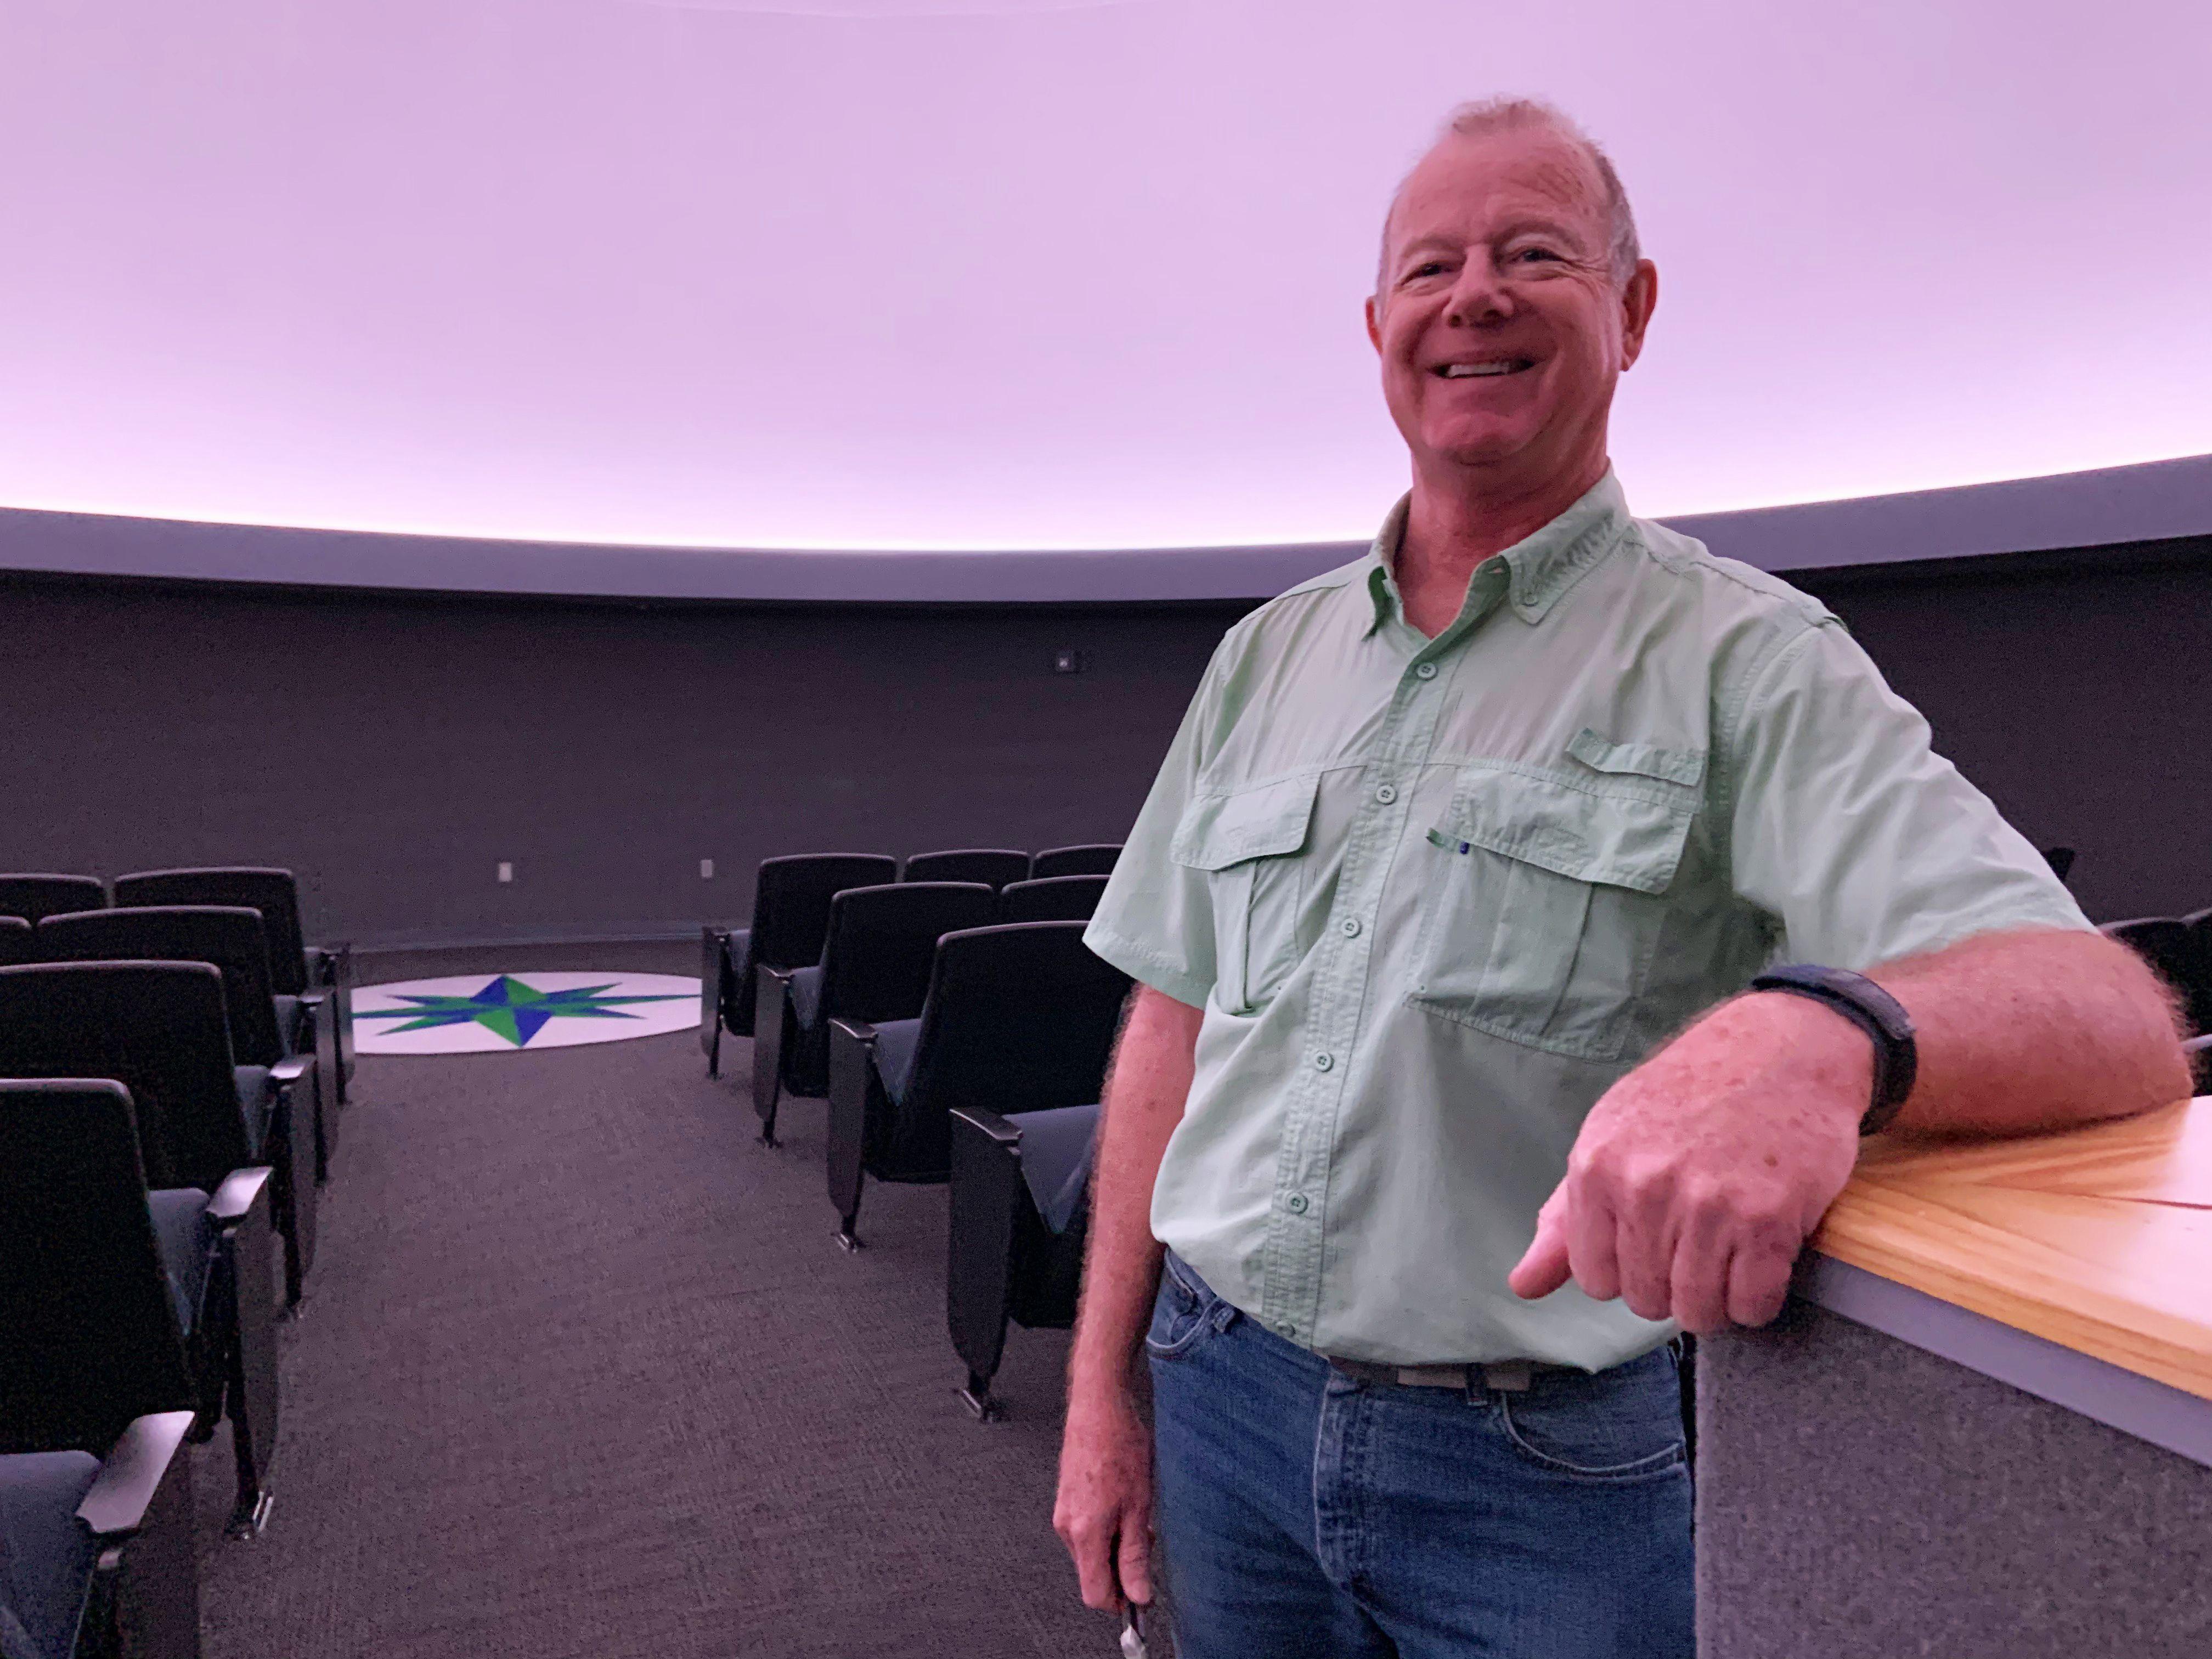 decorative image of billyjackson , Pensacola State's Planetarium still educating and inspiring thousands after renovation 2020-03-26 12:10:04